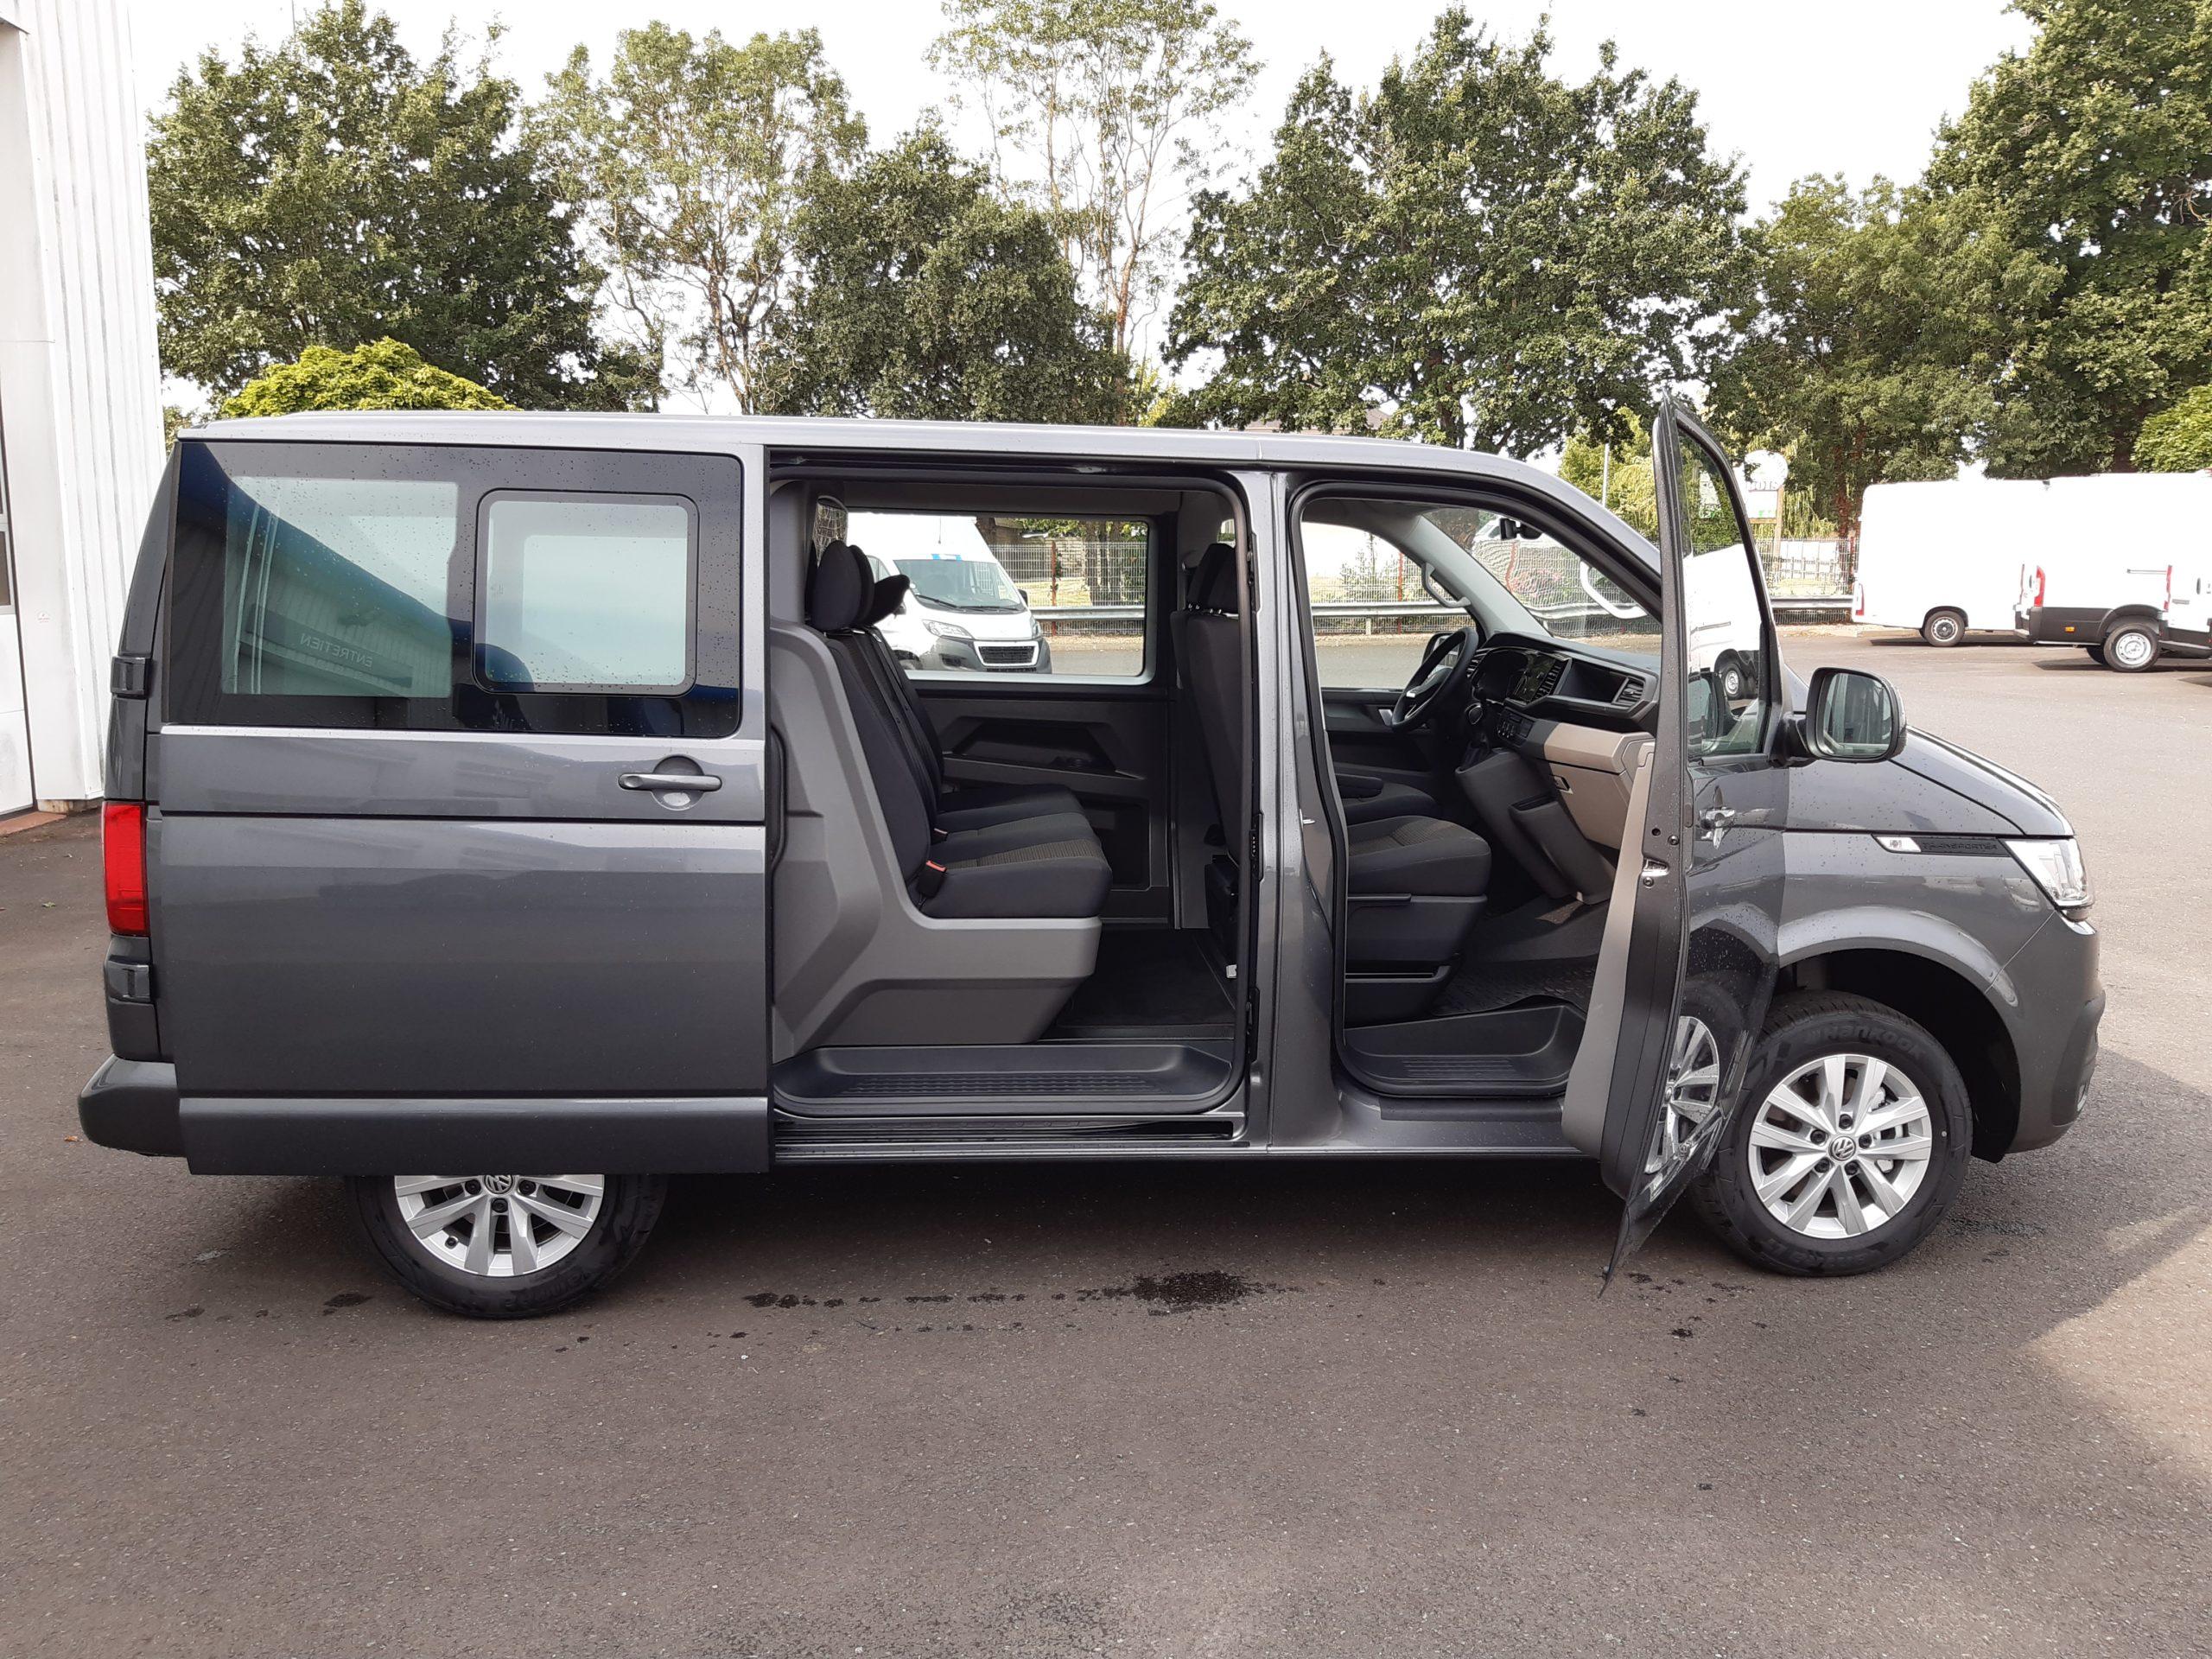 Location d'un fourgon compact double cabine - Volkswagen T6-1 Cabine APP -Vue12